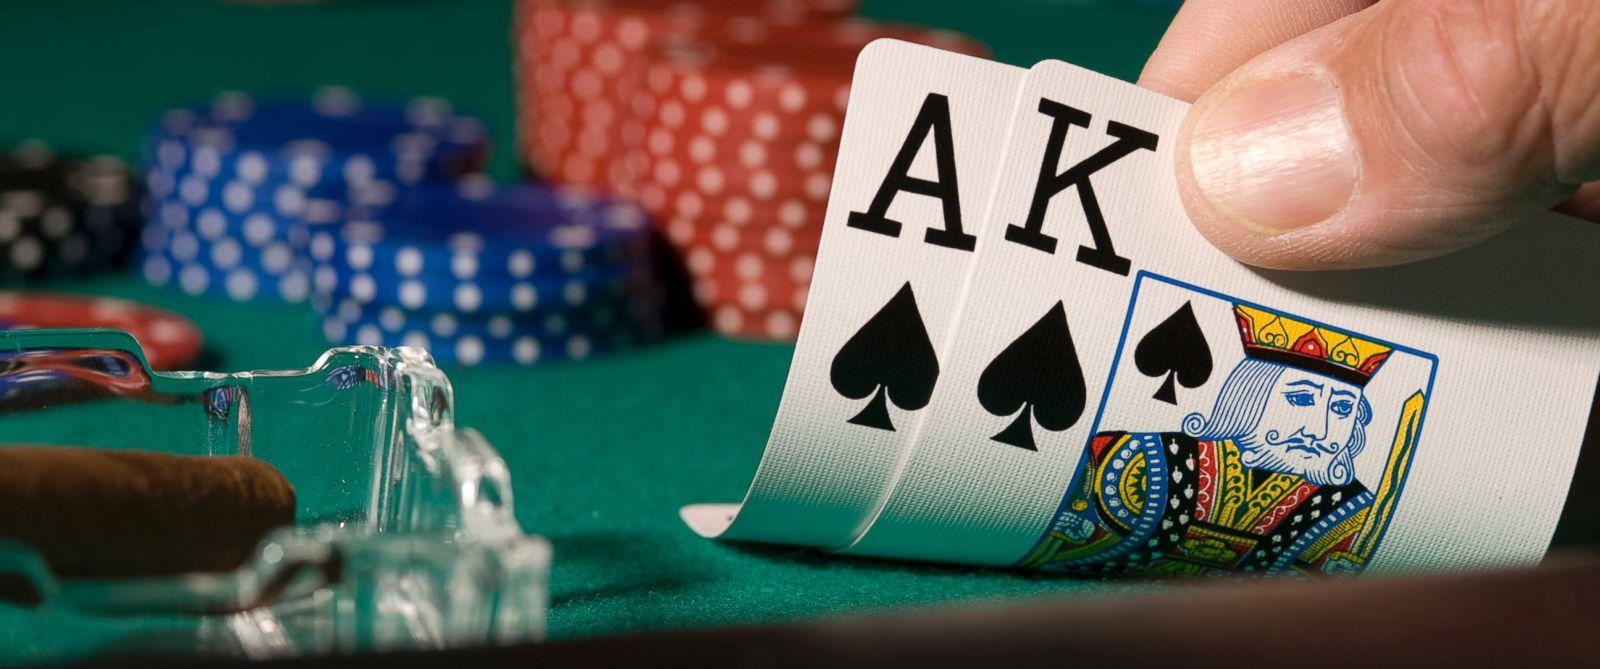 Orting eagles poker